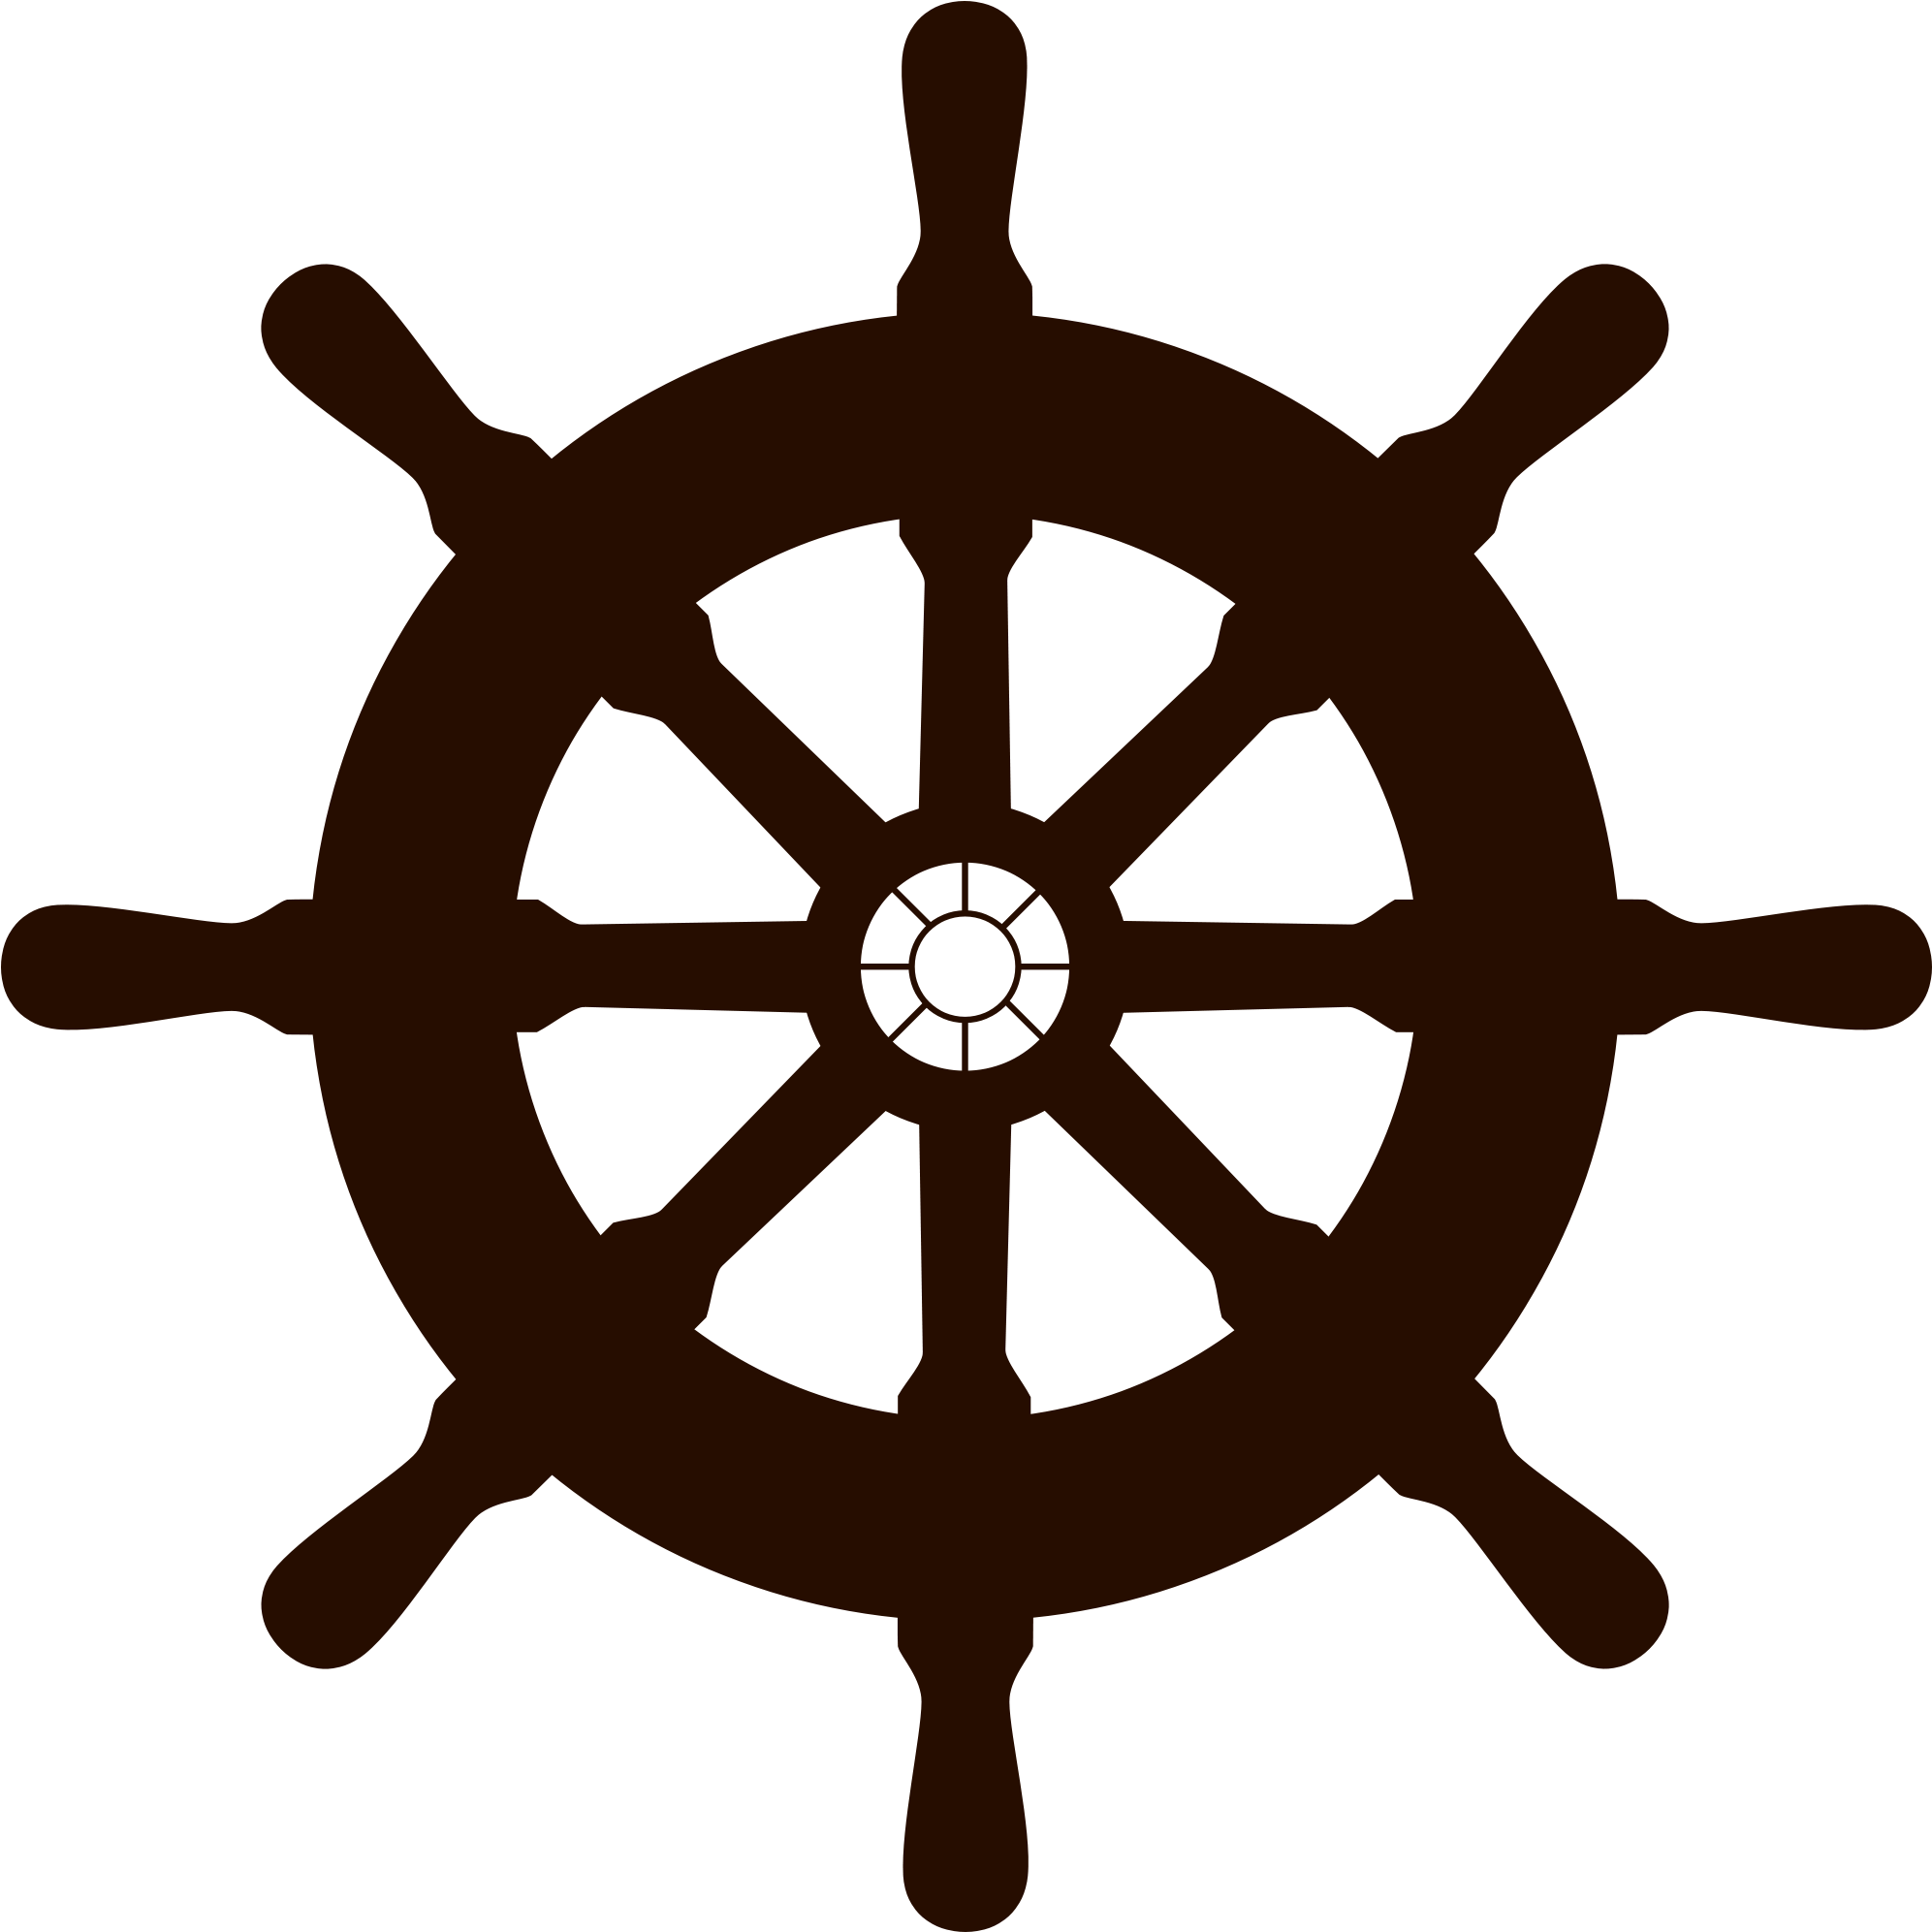 Transparent ship steering wheel clipart - Ship Wheel Png Transparent - Broadway.com Inc